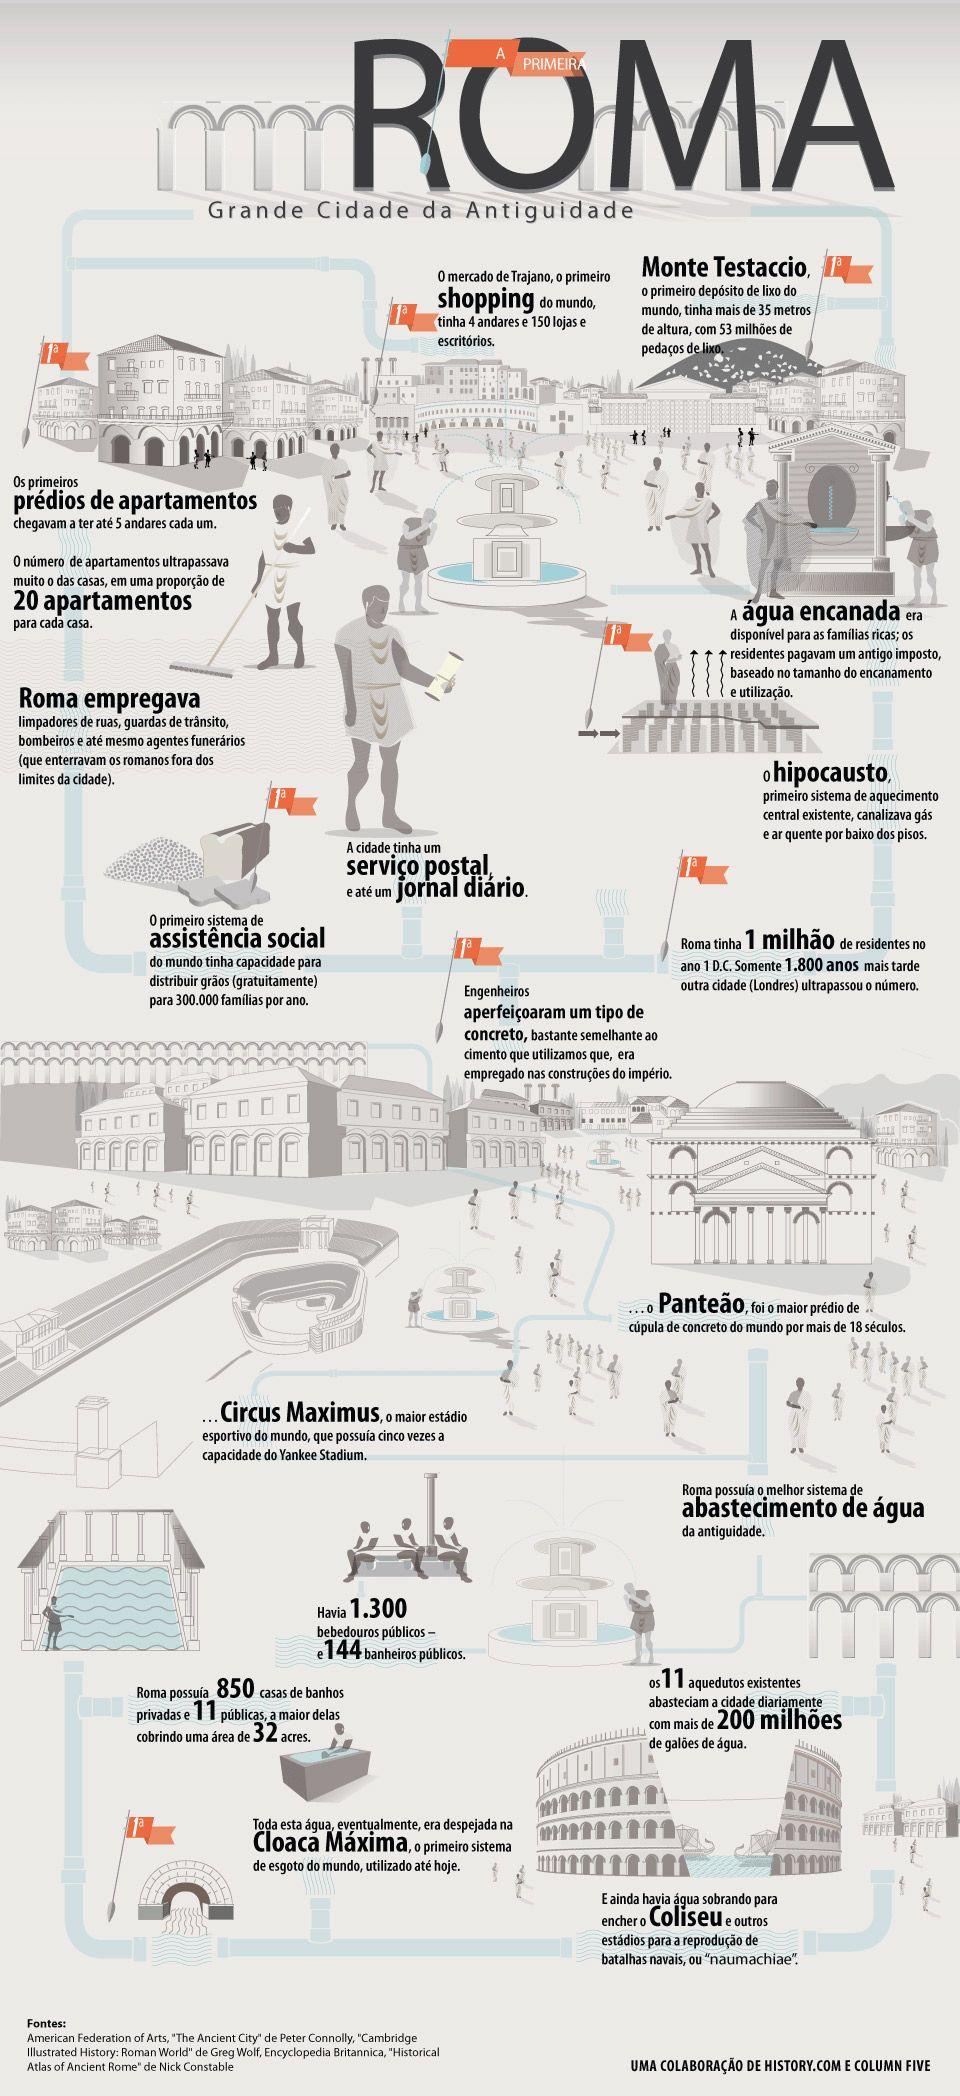 roma grande cidade da antiguidade history ancient rome and